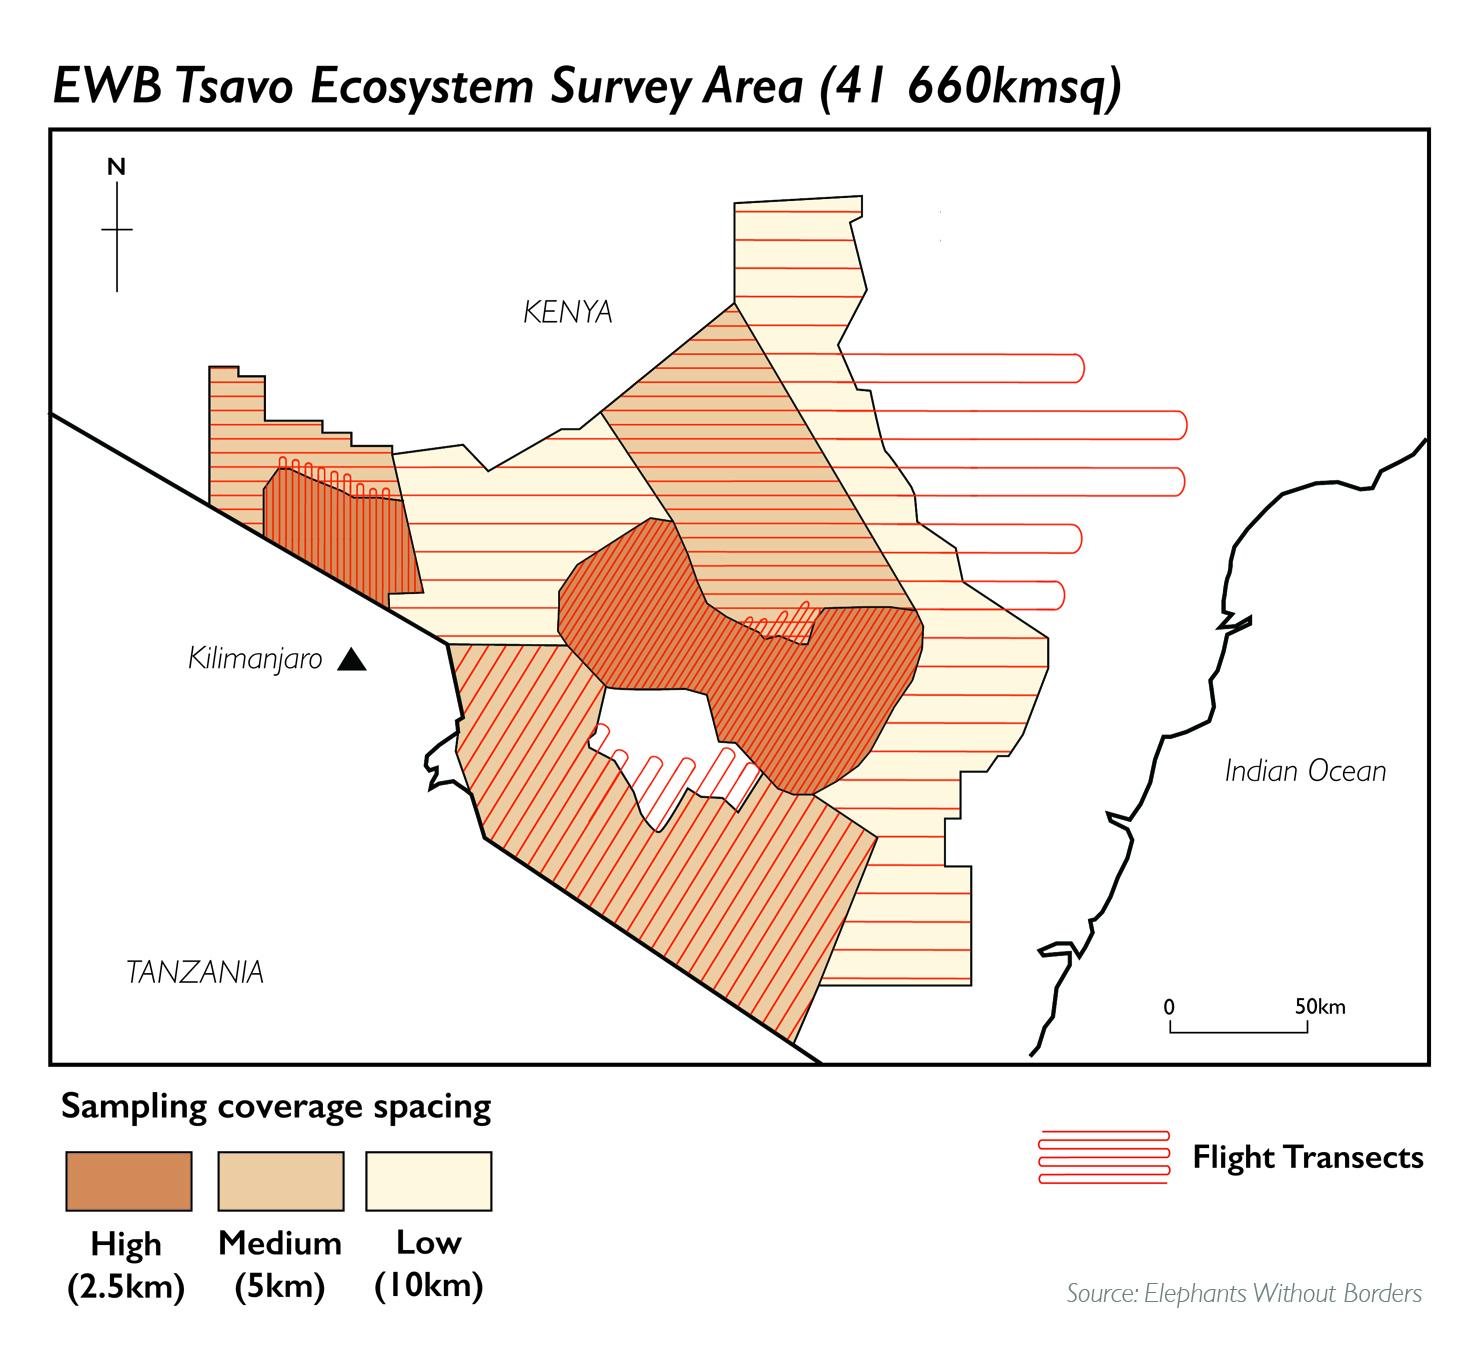 EWB survey area Tsavo